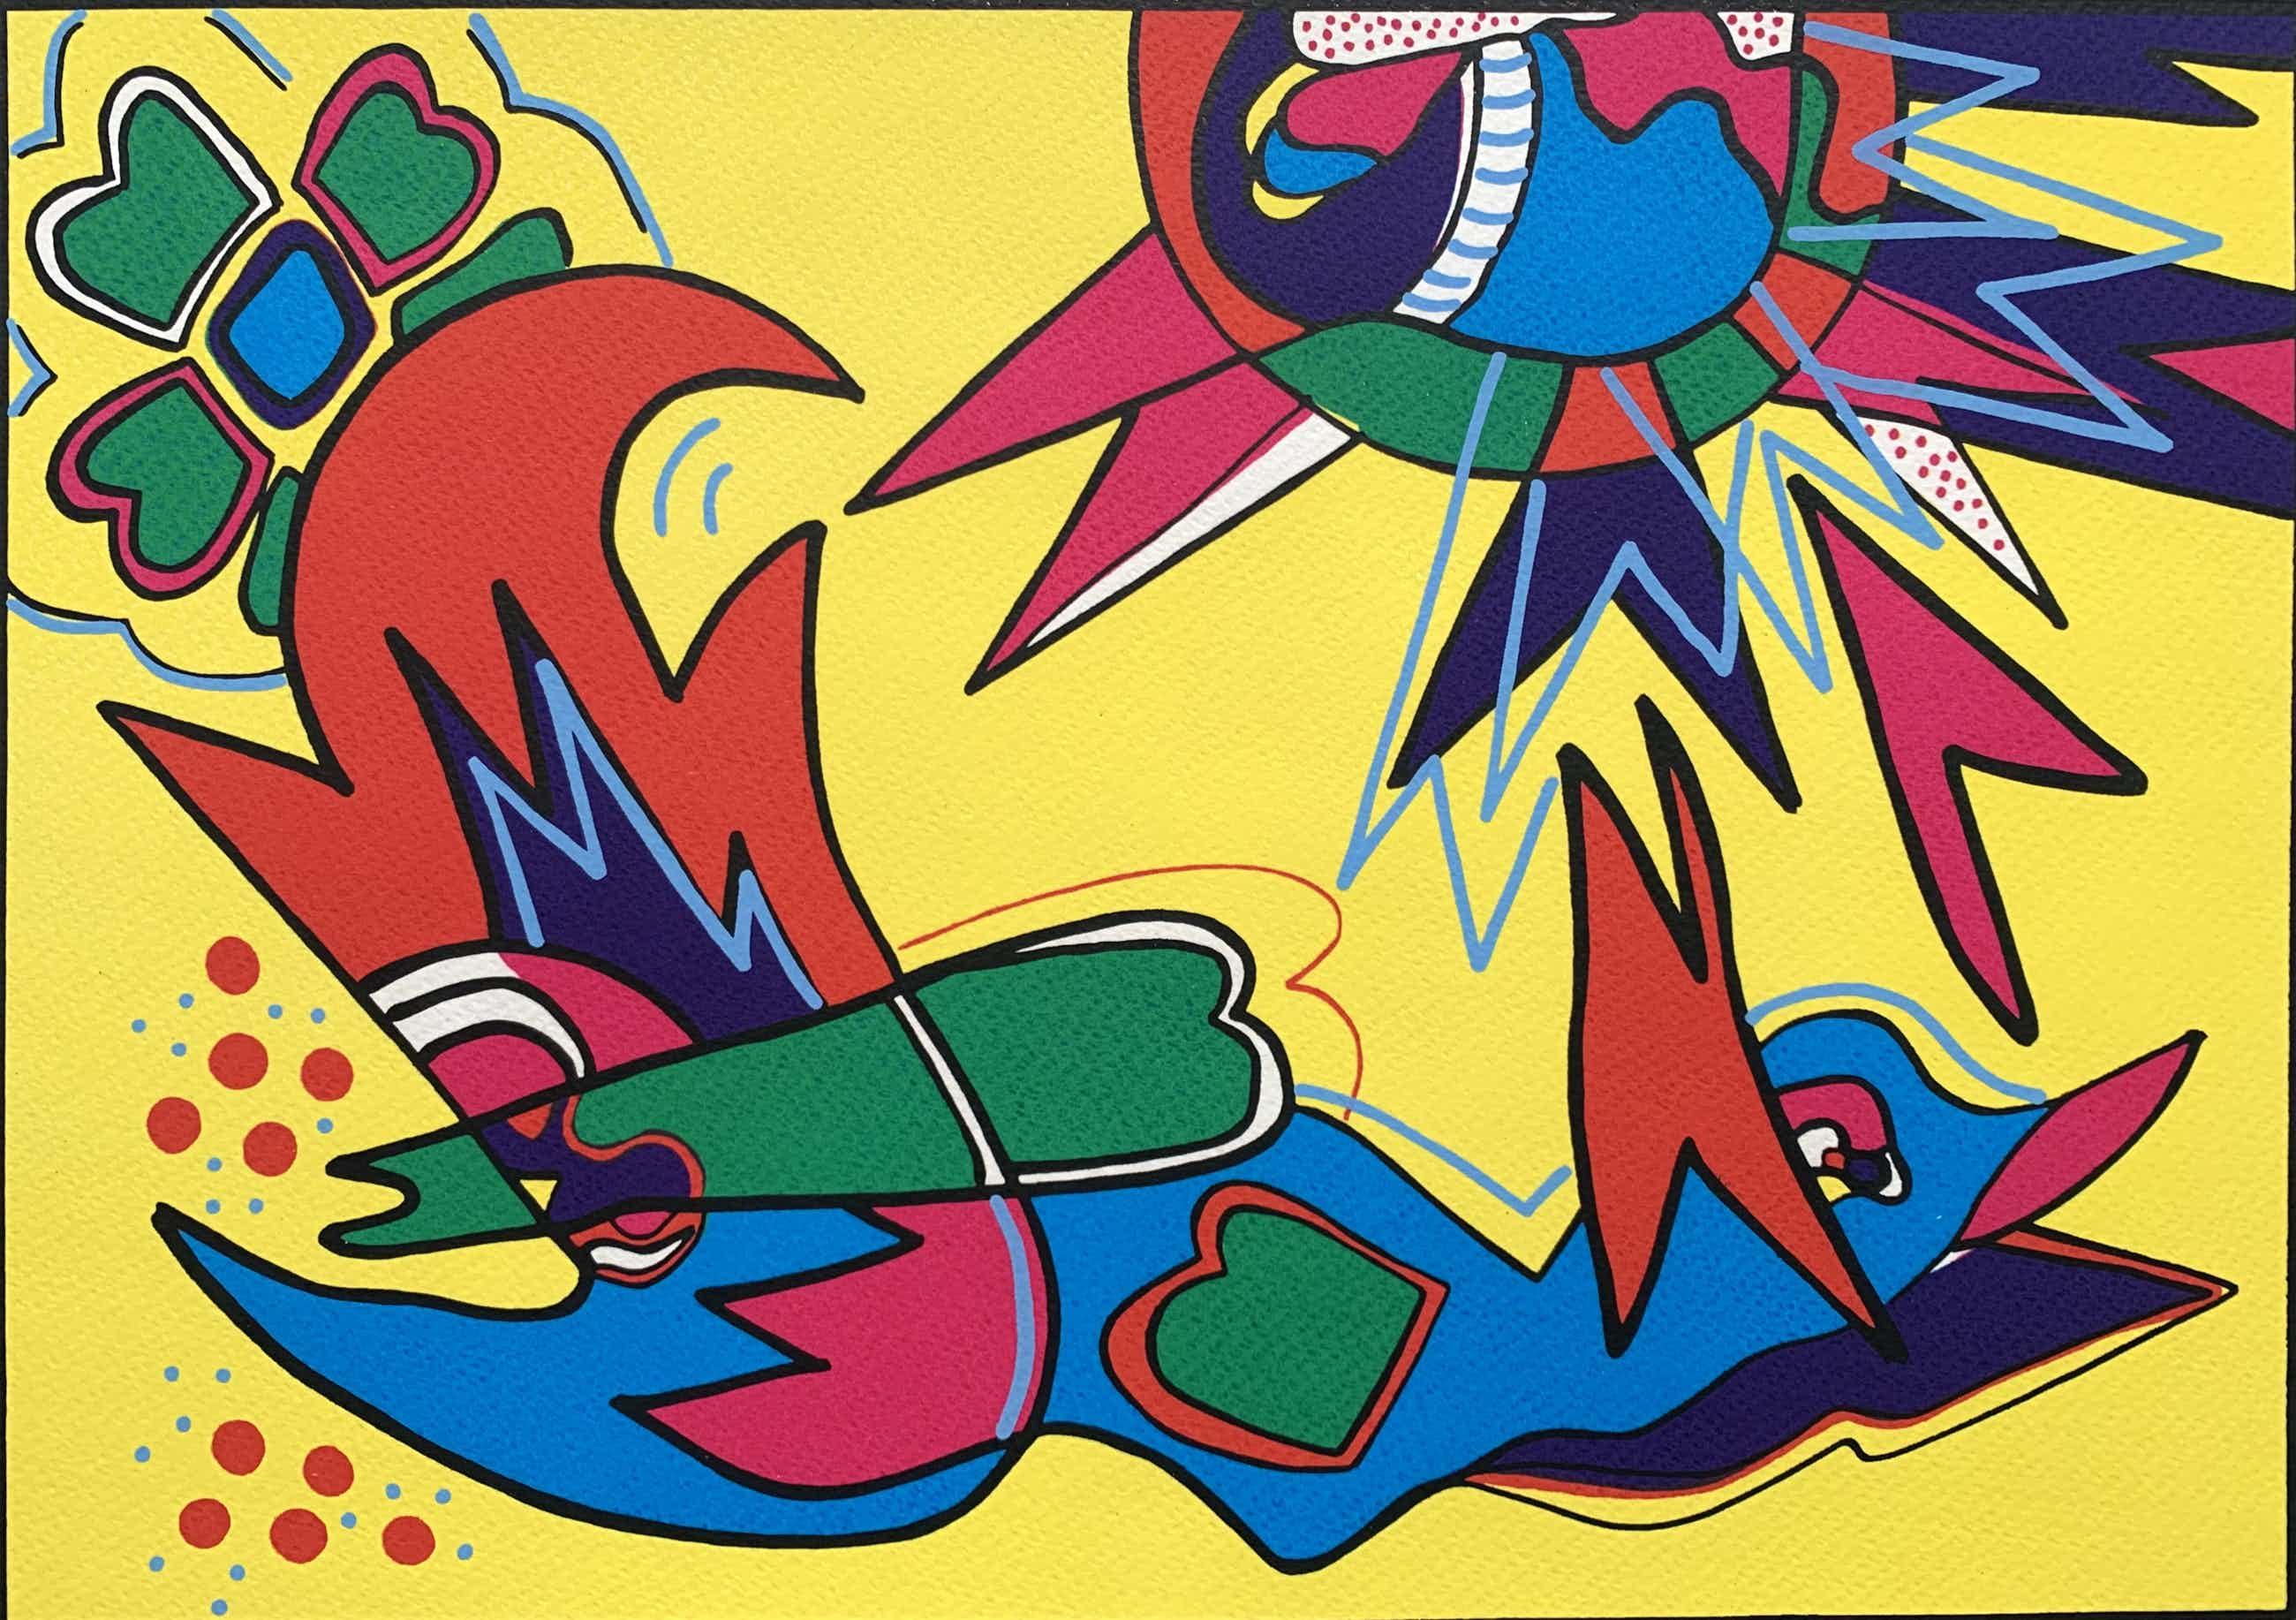 Marianne Naerebout - kleurenzeefdruk   'Early bird'   1995 kopen? Bied vanaf 80!